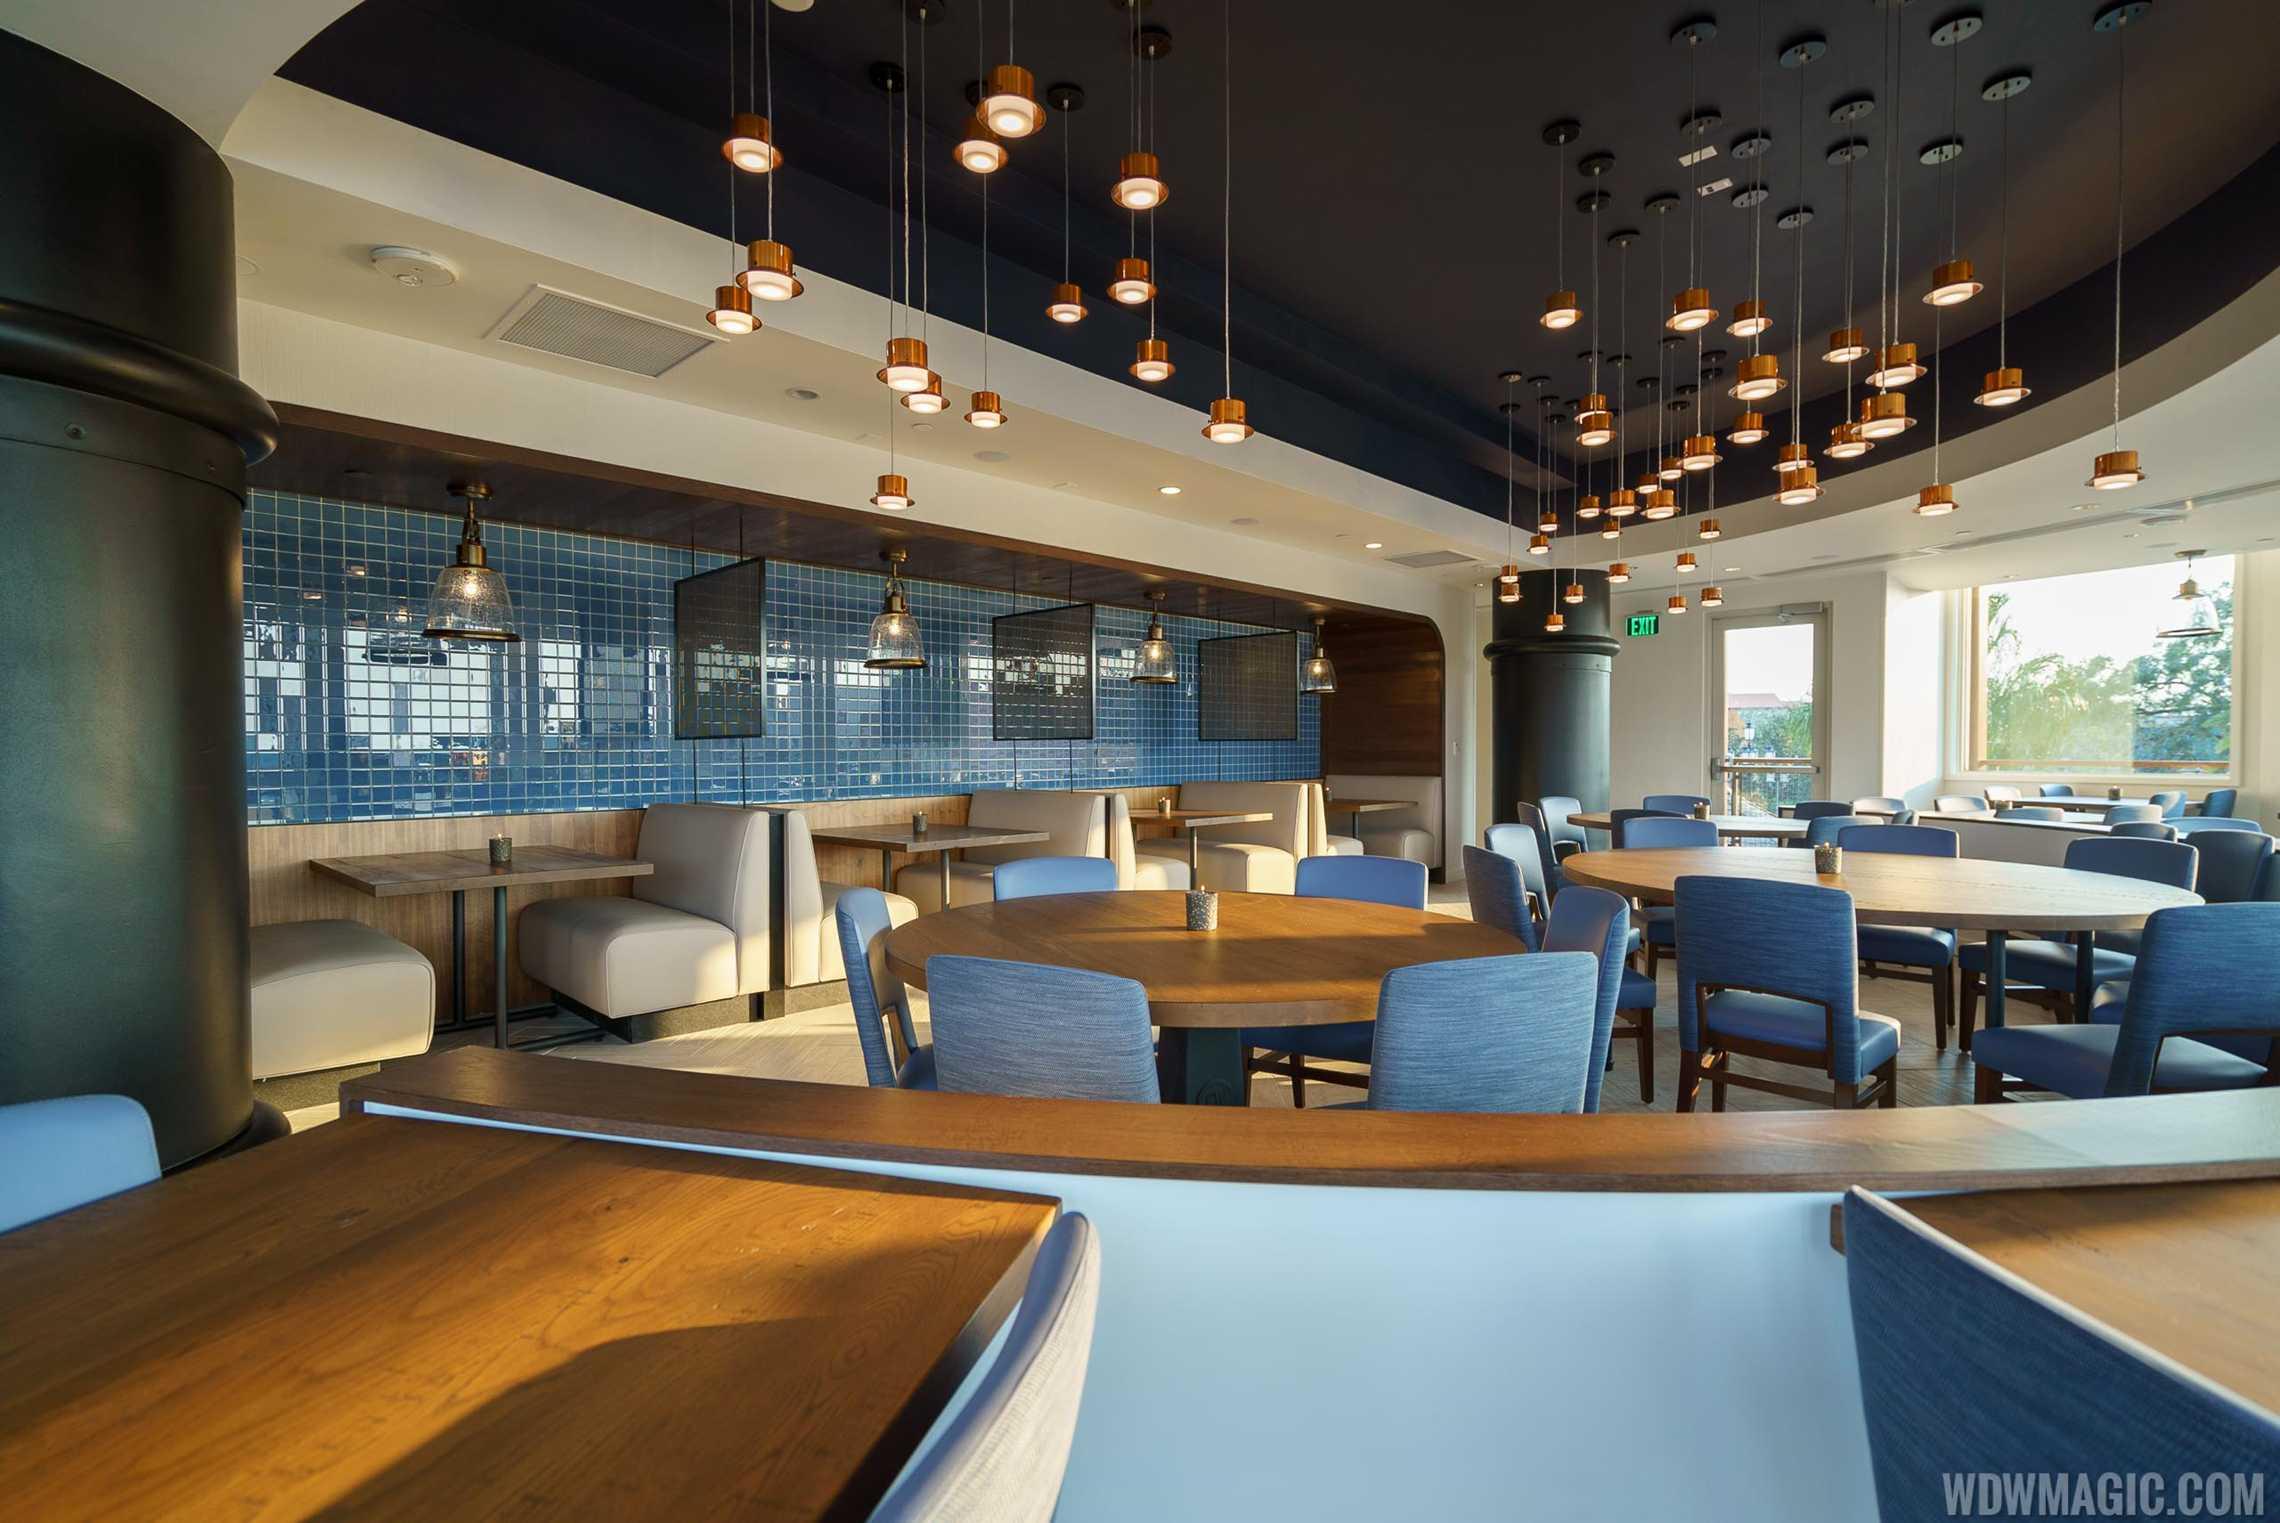 Paddlefish - Mid-deck bow dining room